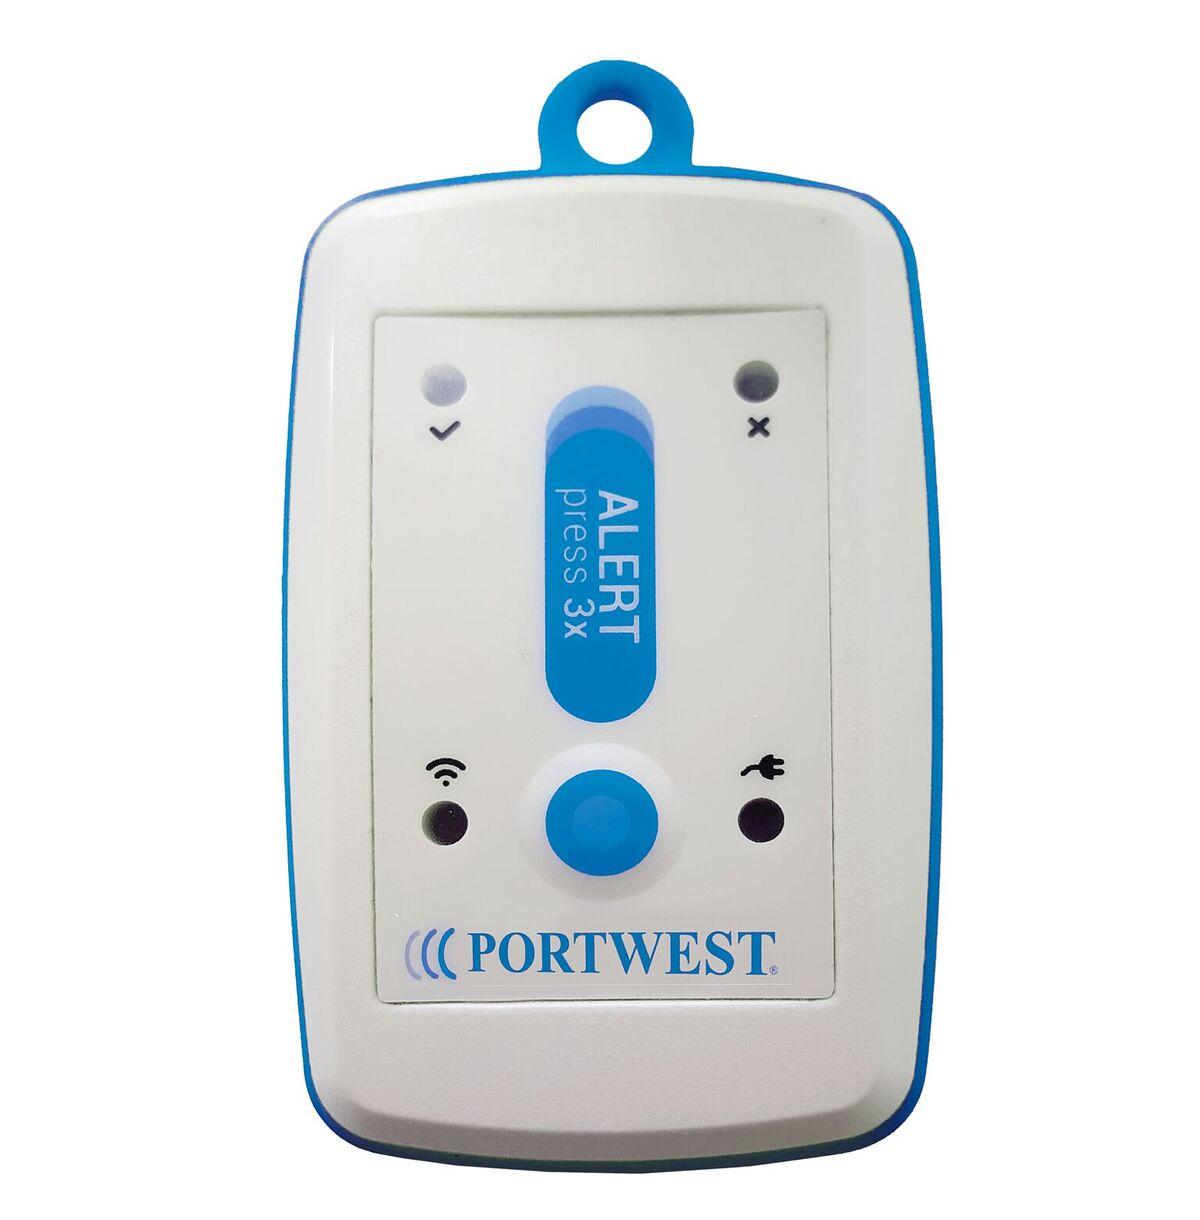 portwest pb10 gps locator v1 wireless geo location lone work tracker